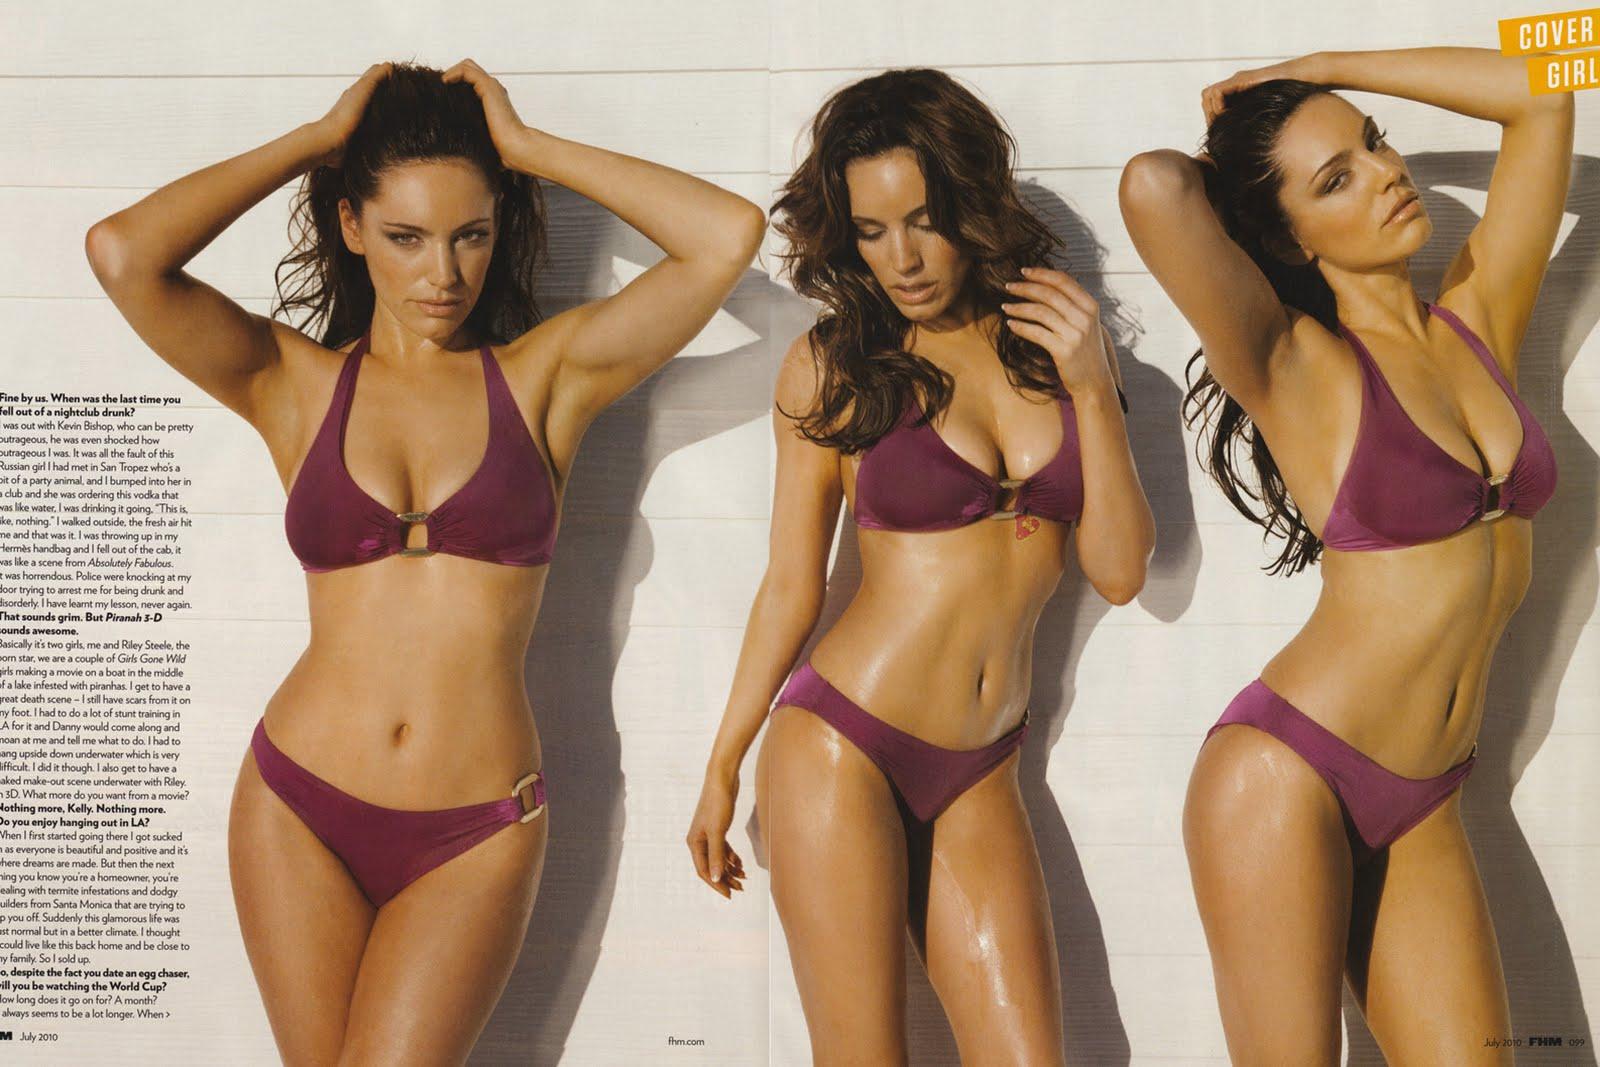 http://1.bp.blogspot.com/_s8CP9sXvx9o/TA2cqmzvrbI/AAAAAAAAB1k/HM23Q9xpPV8/s1600/kelly-brook-fhm-bikini-29.jpg